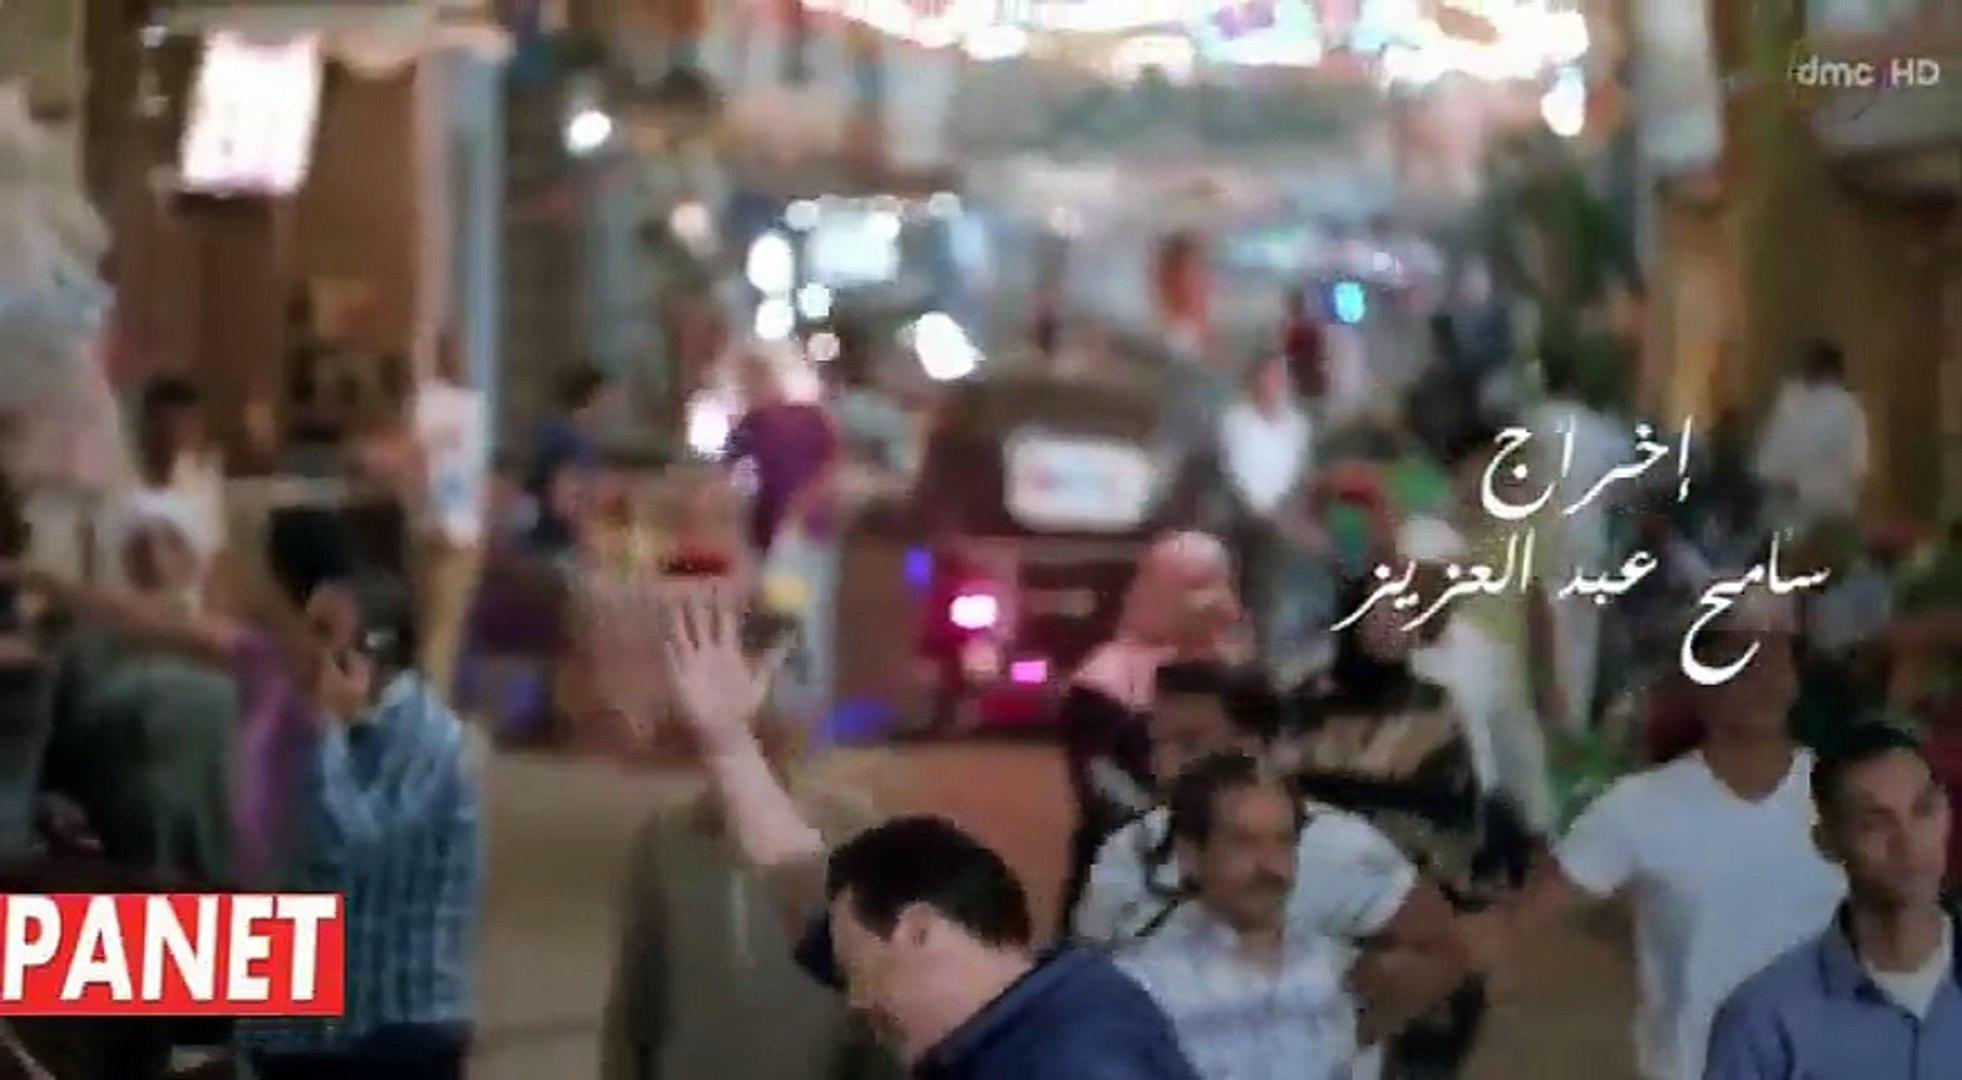 Panet مسلسلات رمضان 2019